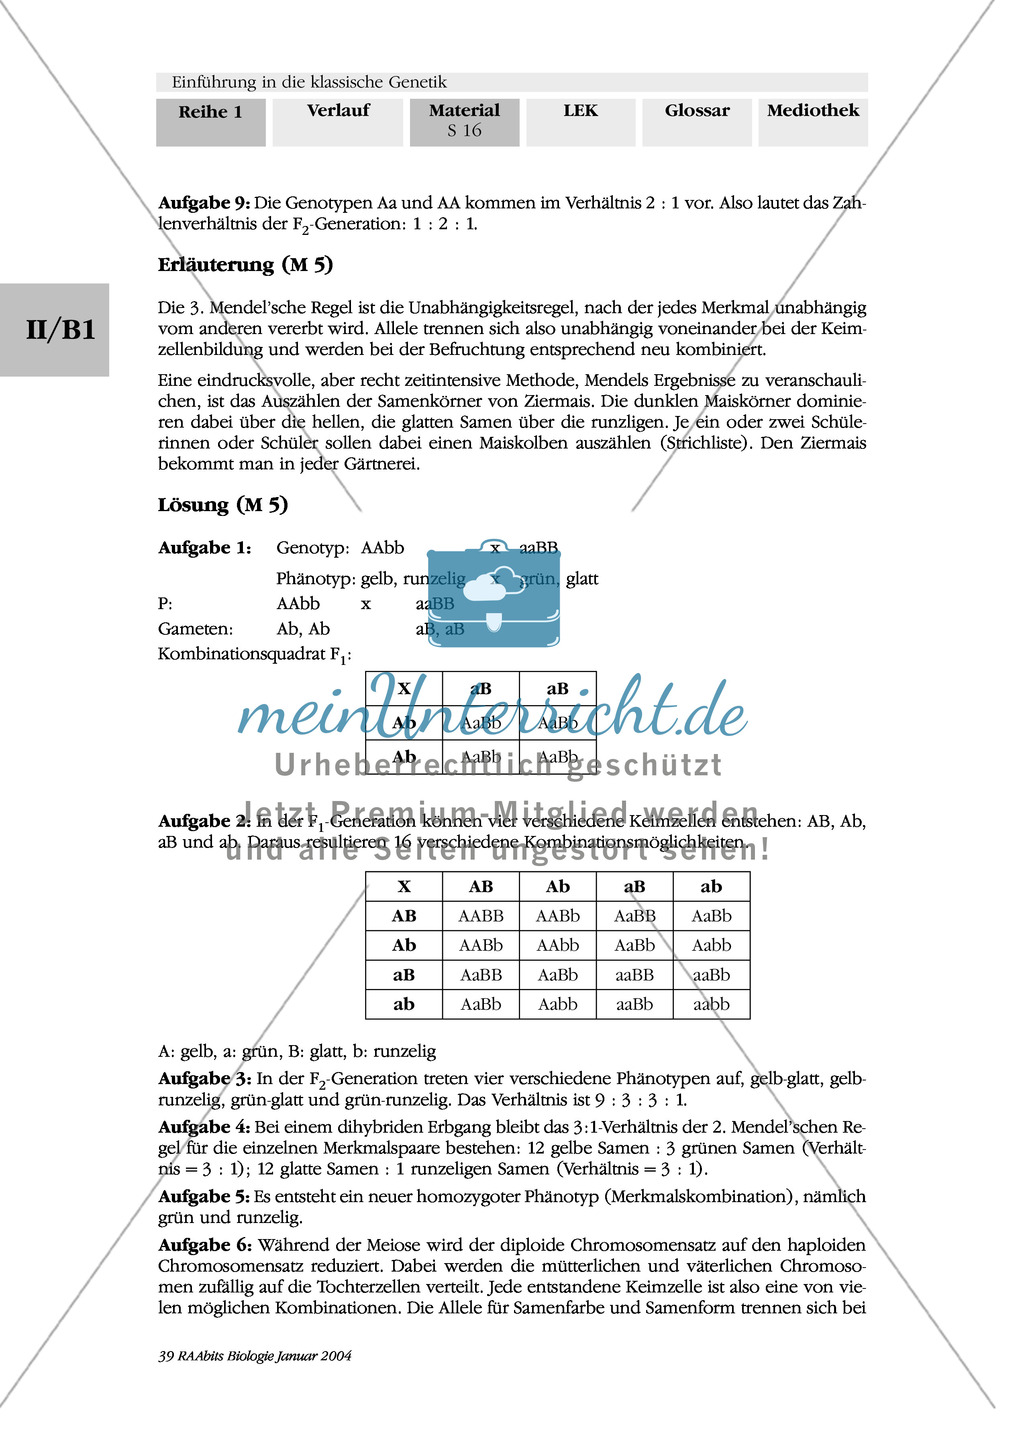 Klassische Genetik: Mendel`sche Regeln - Begriffe, Regeln, Kodominanz Preview 12